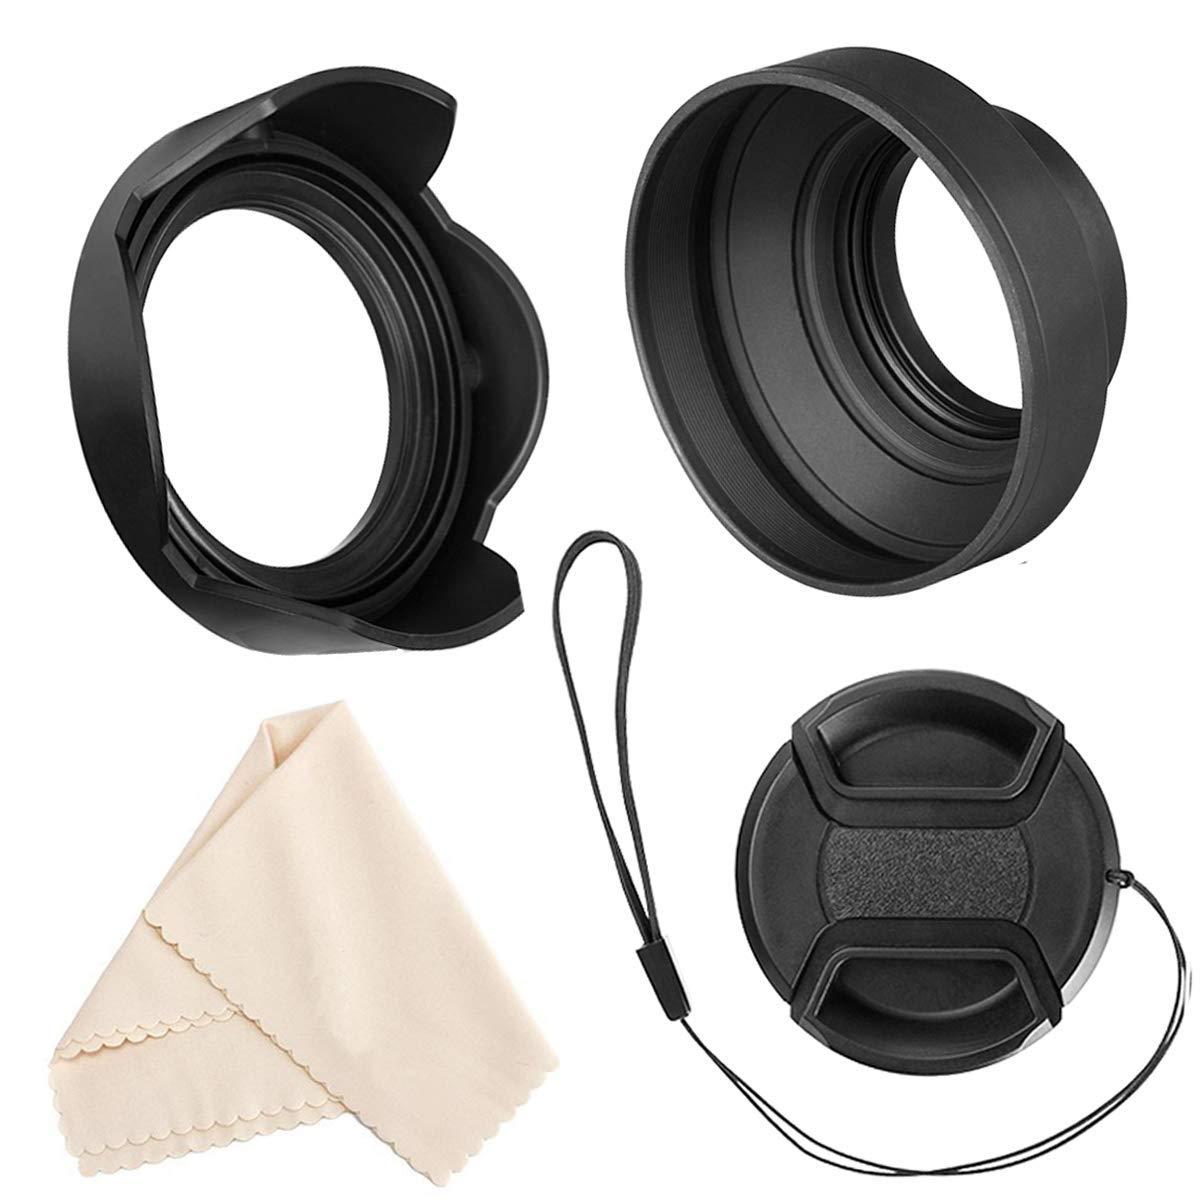 67mm UV Filter PRO Tulip Lens Hood for Canon EF-S 18-135mm f//3.5-5.6 is STM 67mm Florescent Filter /& 67mm Flower Lens Shade Hood is USM 67 mm Polarizing Filter PRO 67mm Filter Kit